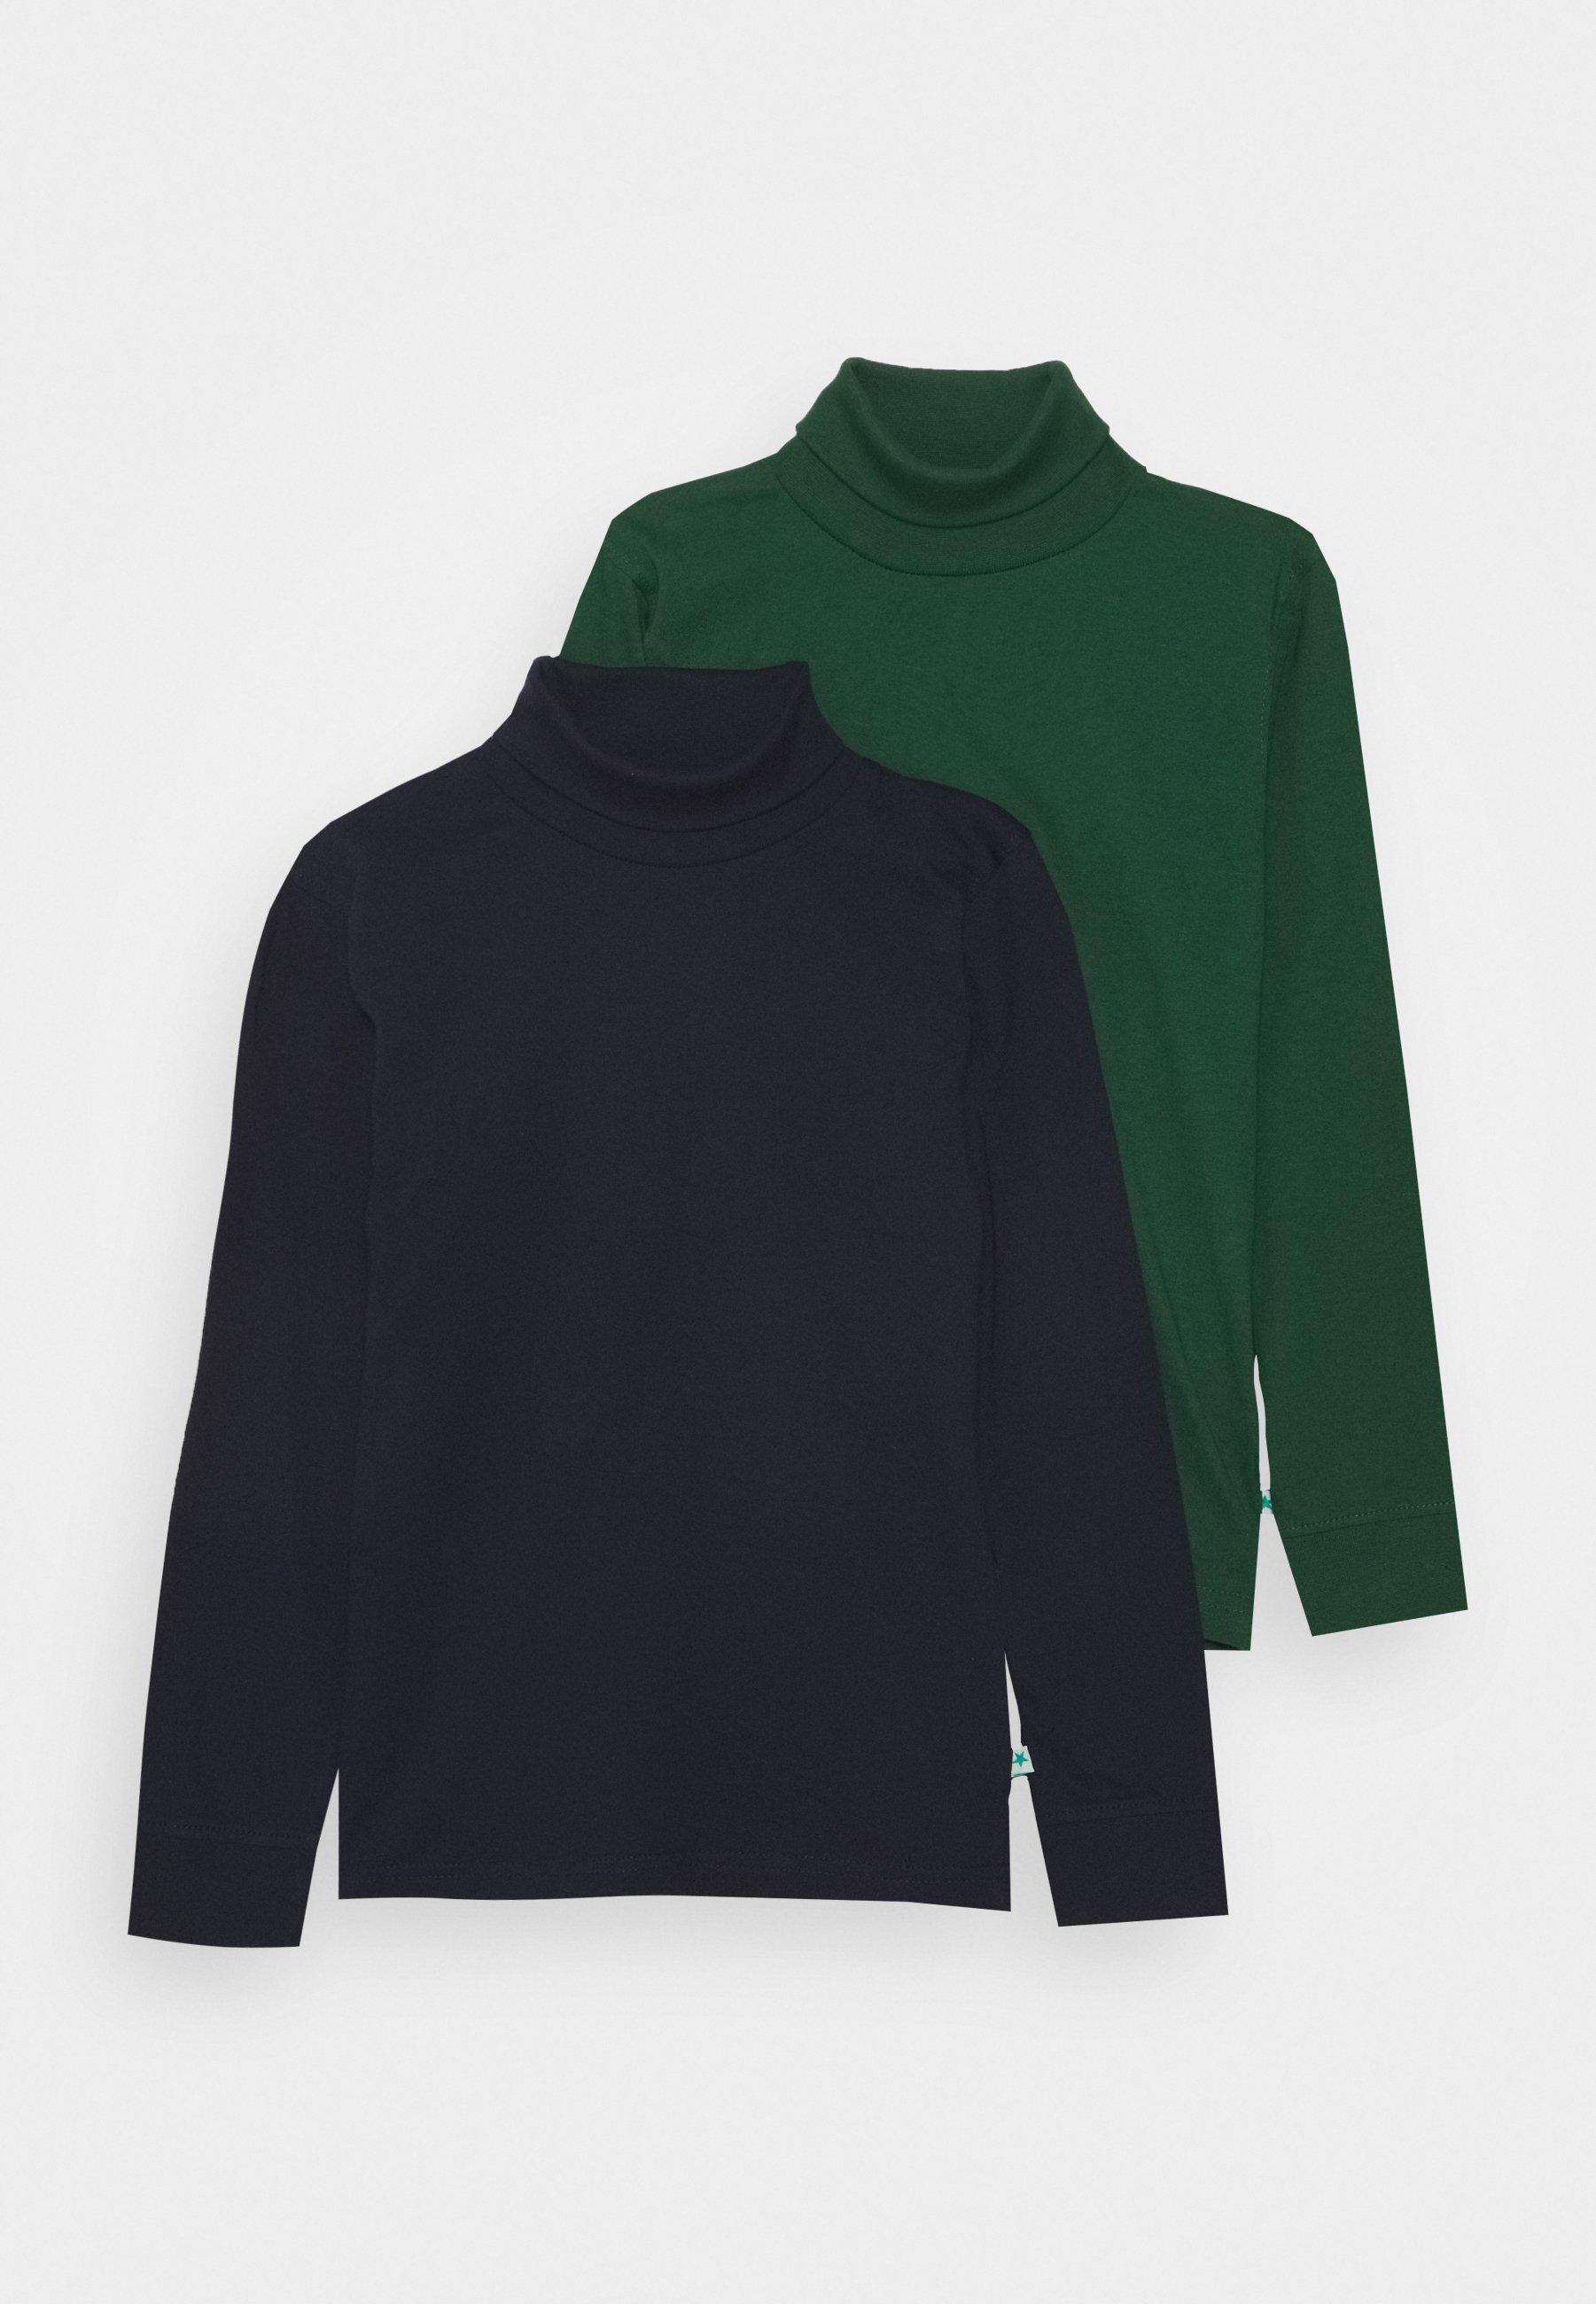 KIDS BASIC ROLLNECK 2 PACK Långärmad tröja nachtblautanne